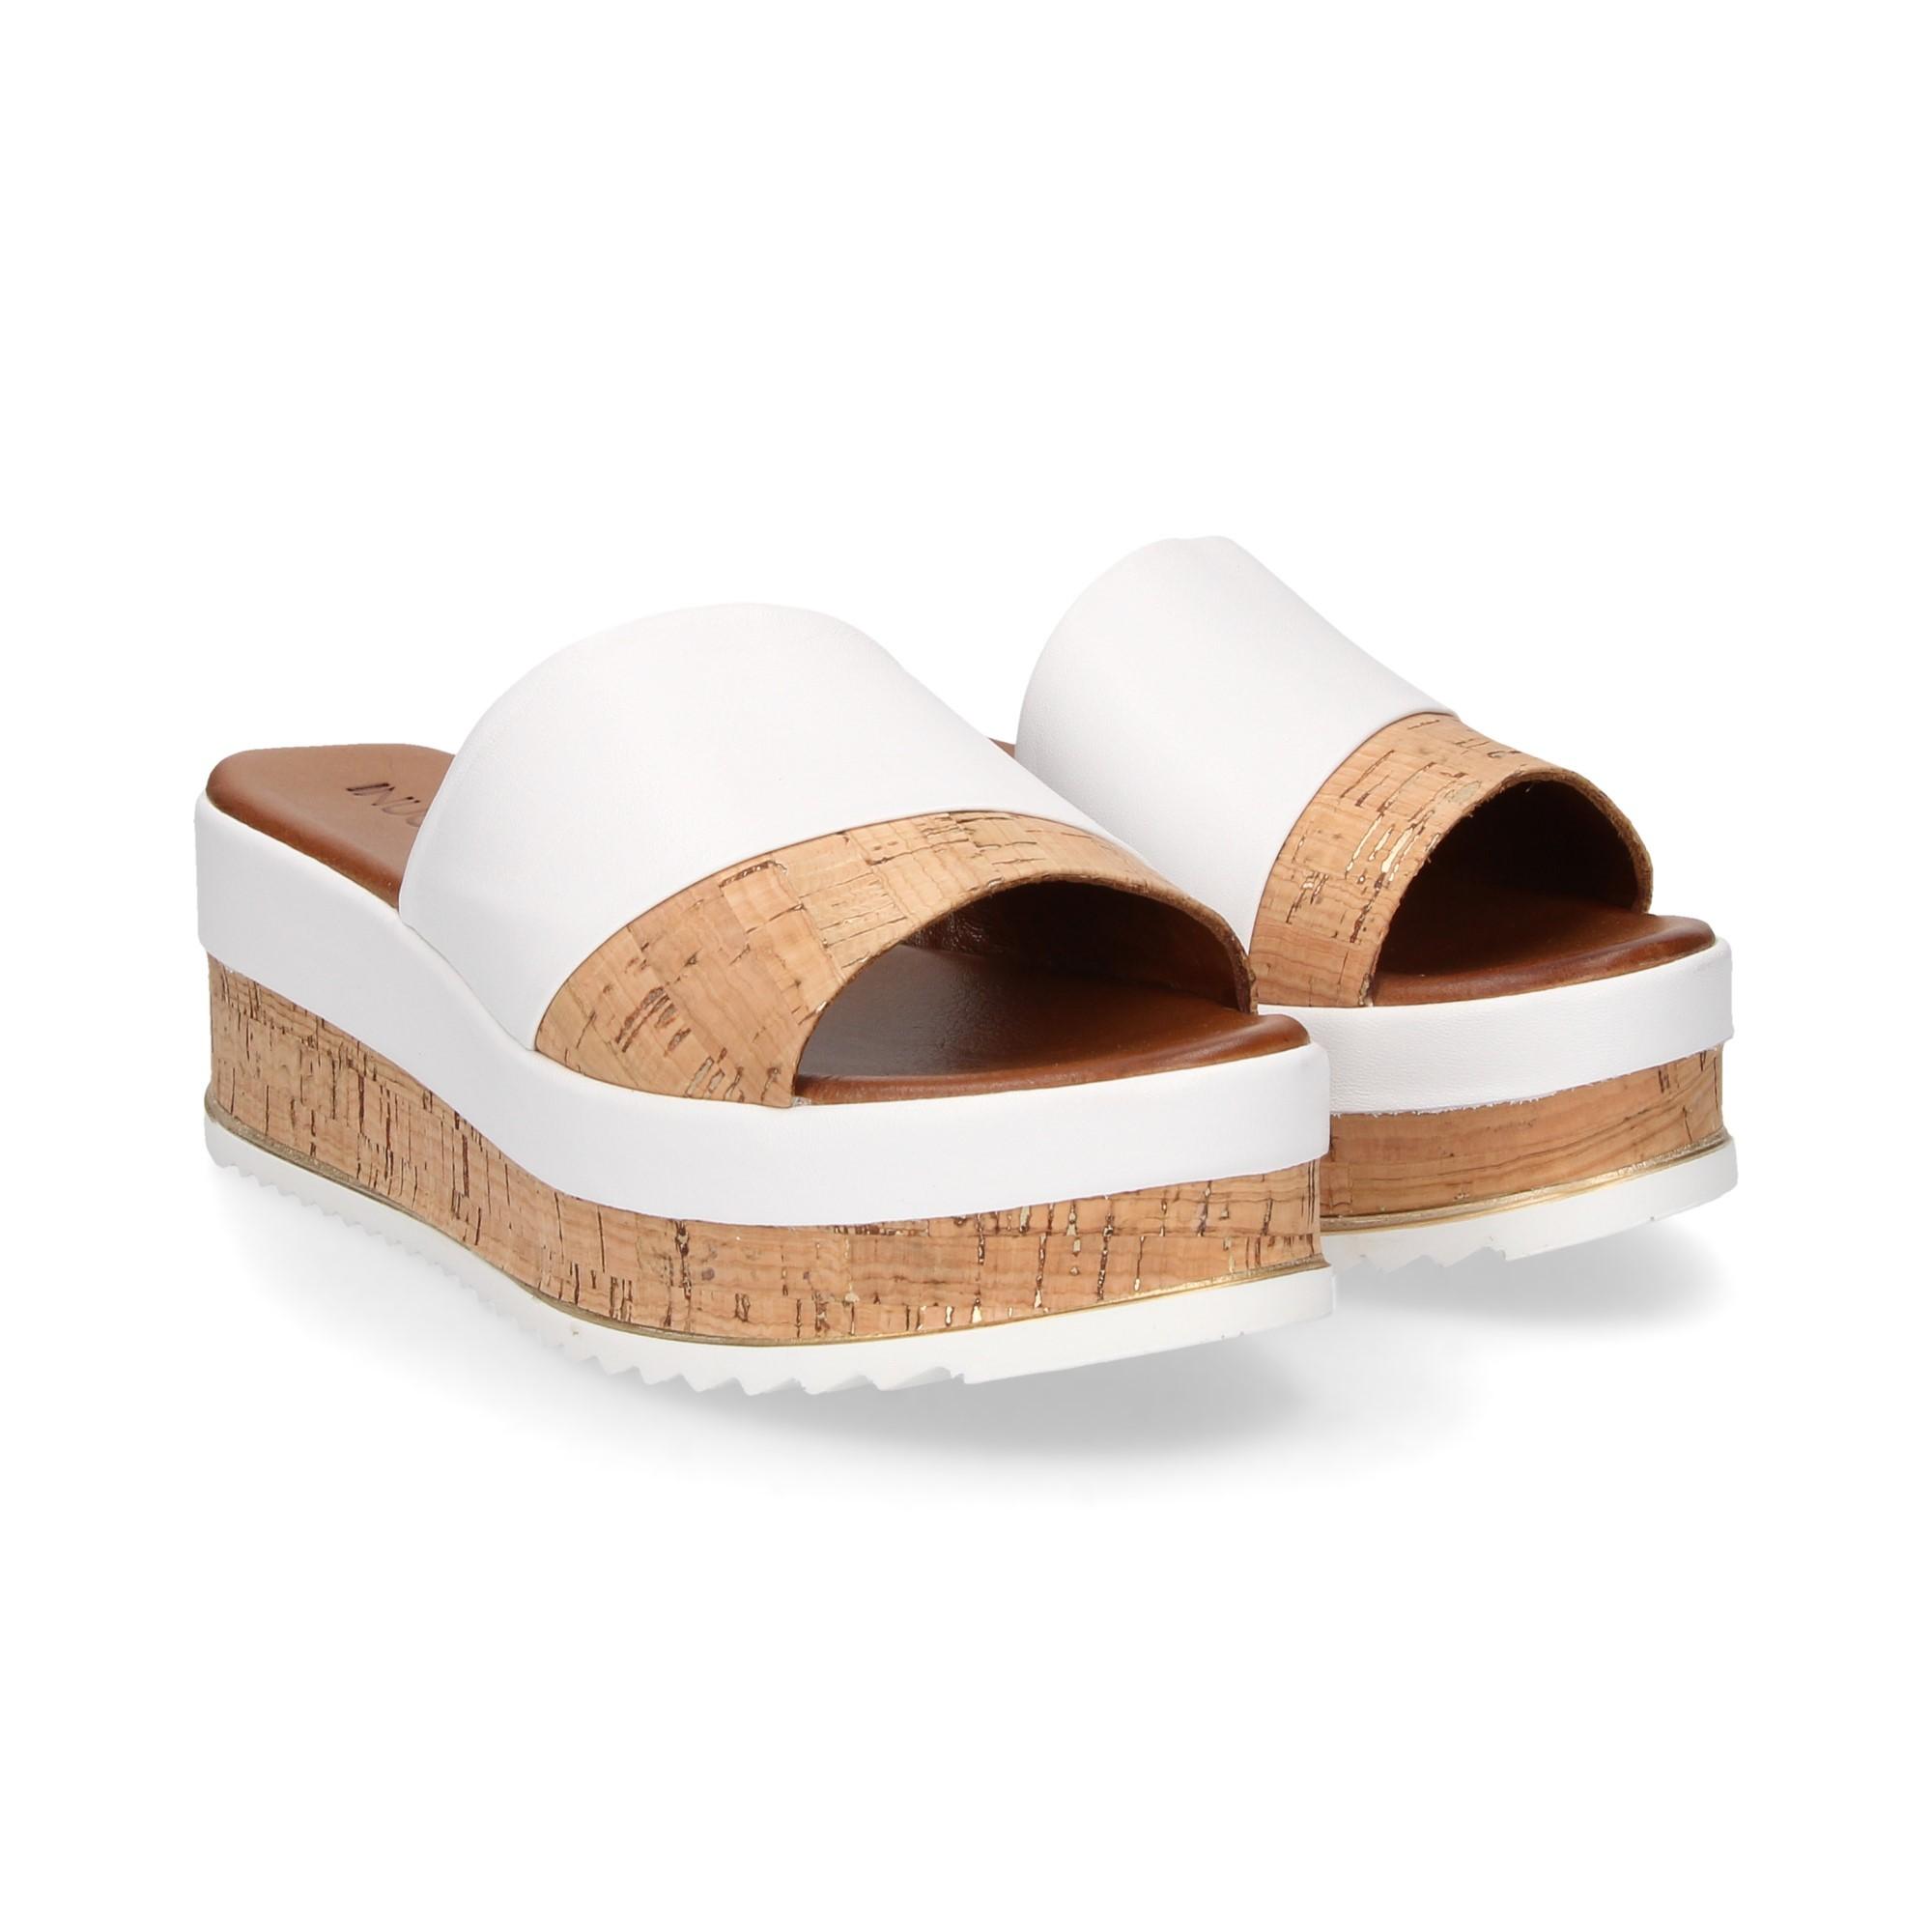 Femmes 8843 Blanco Inuovo Compensées Pour Sandales rxBoWEQCed